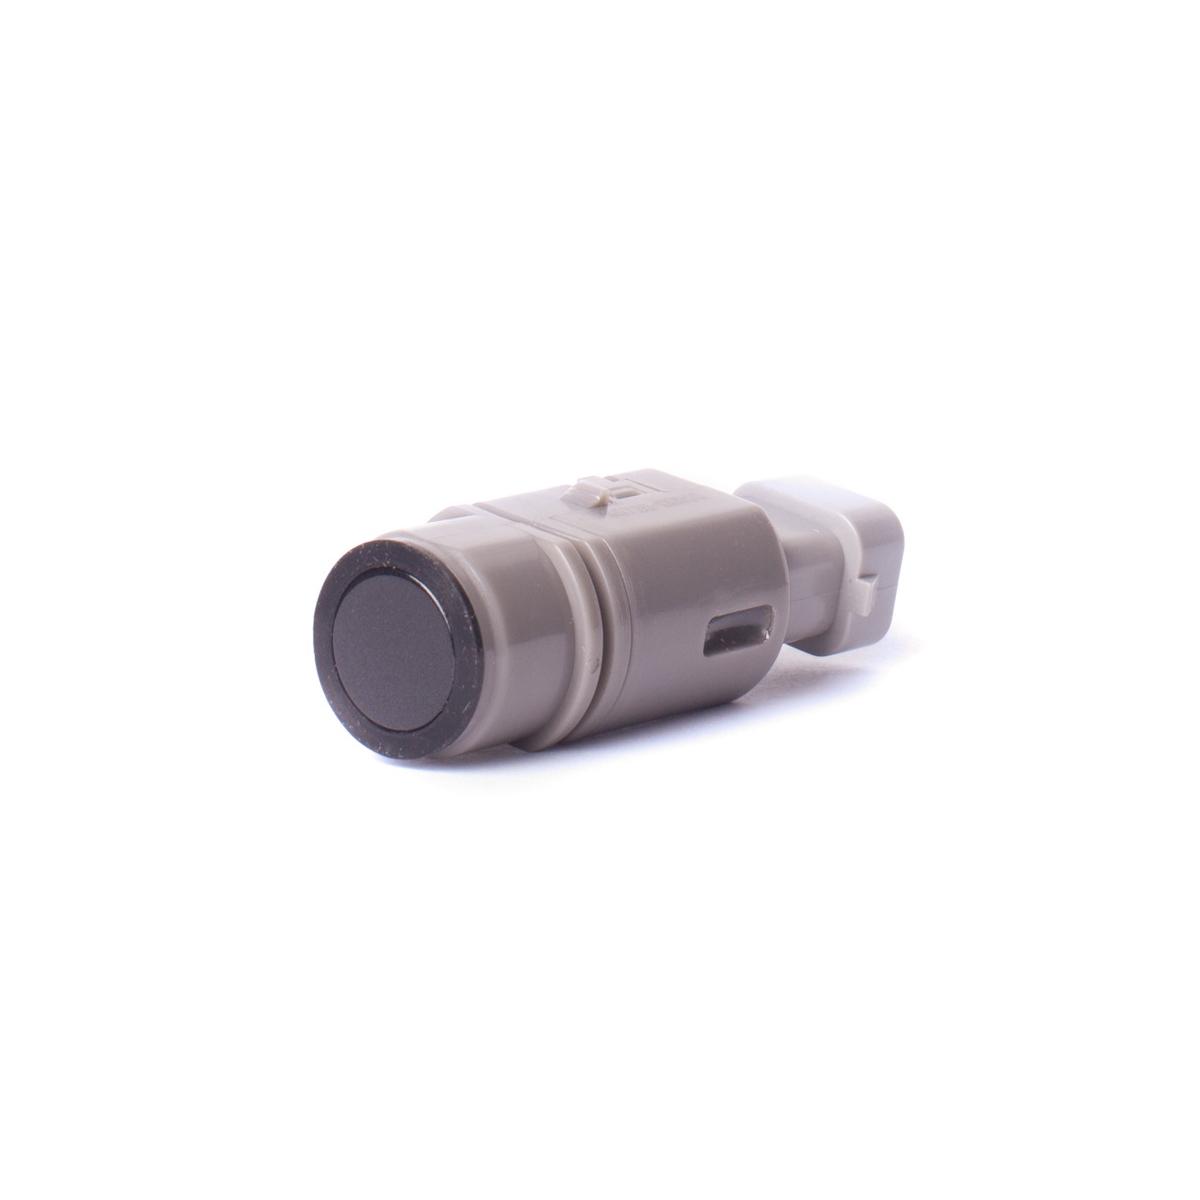 Park sensor 95720-1X000 for Hyundai PDC Parktronic